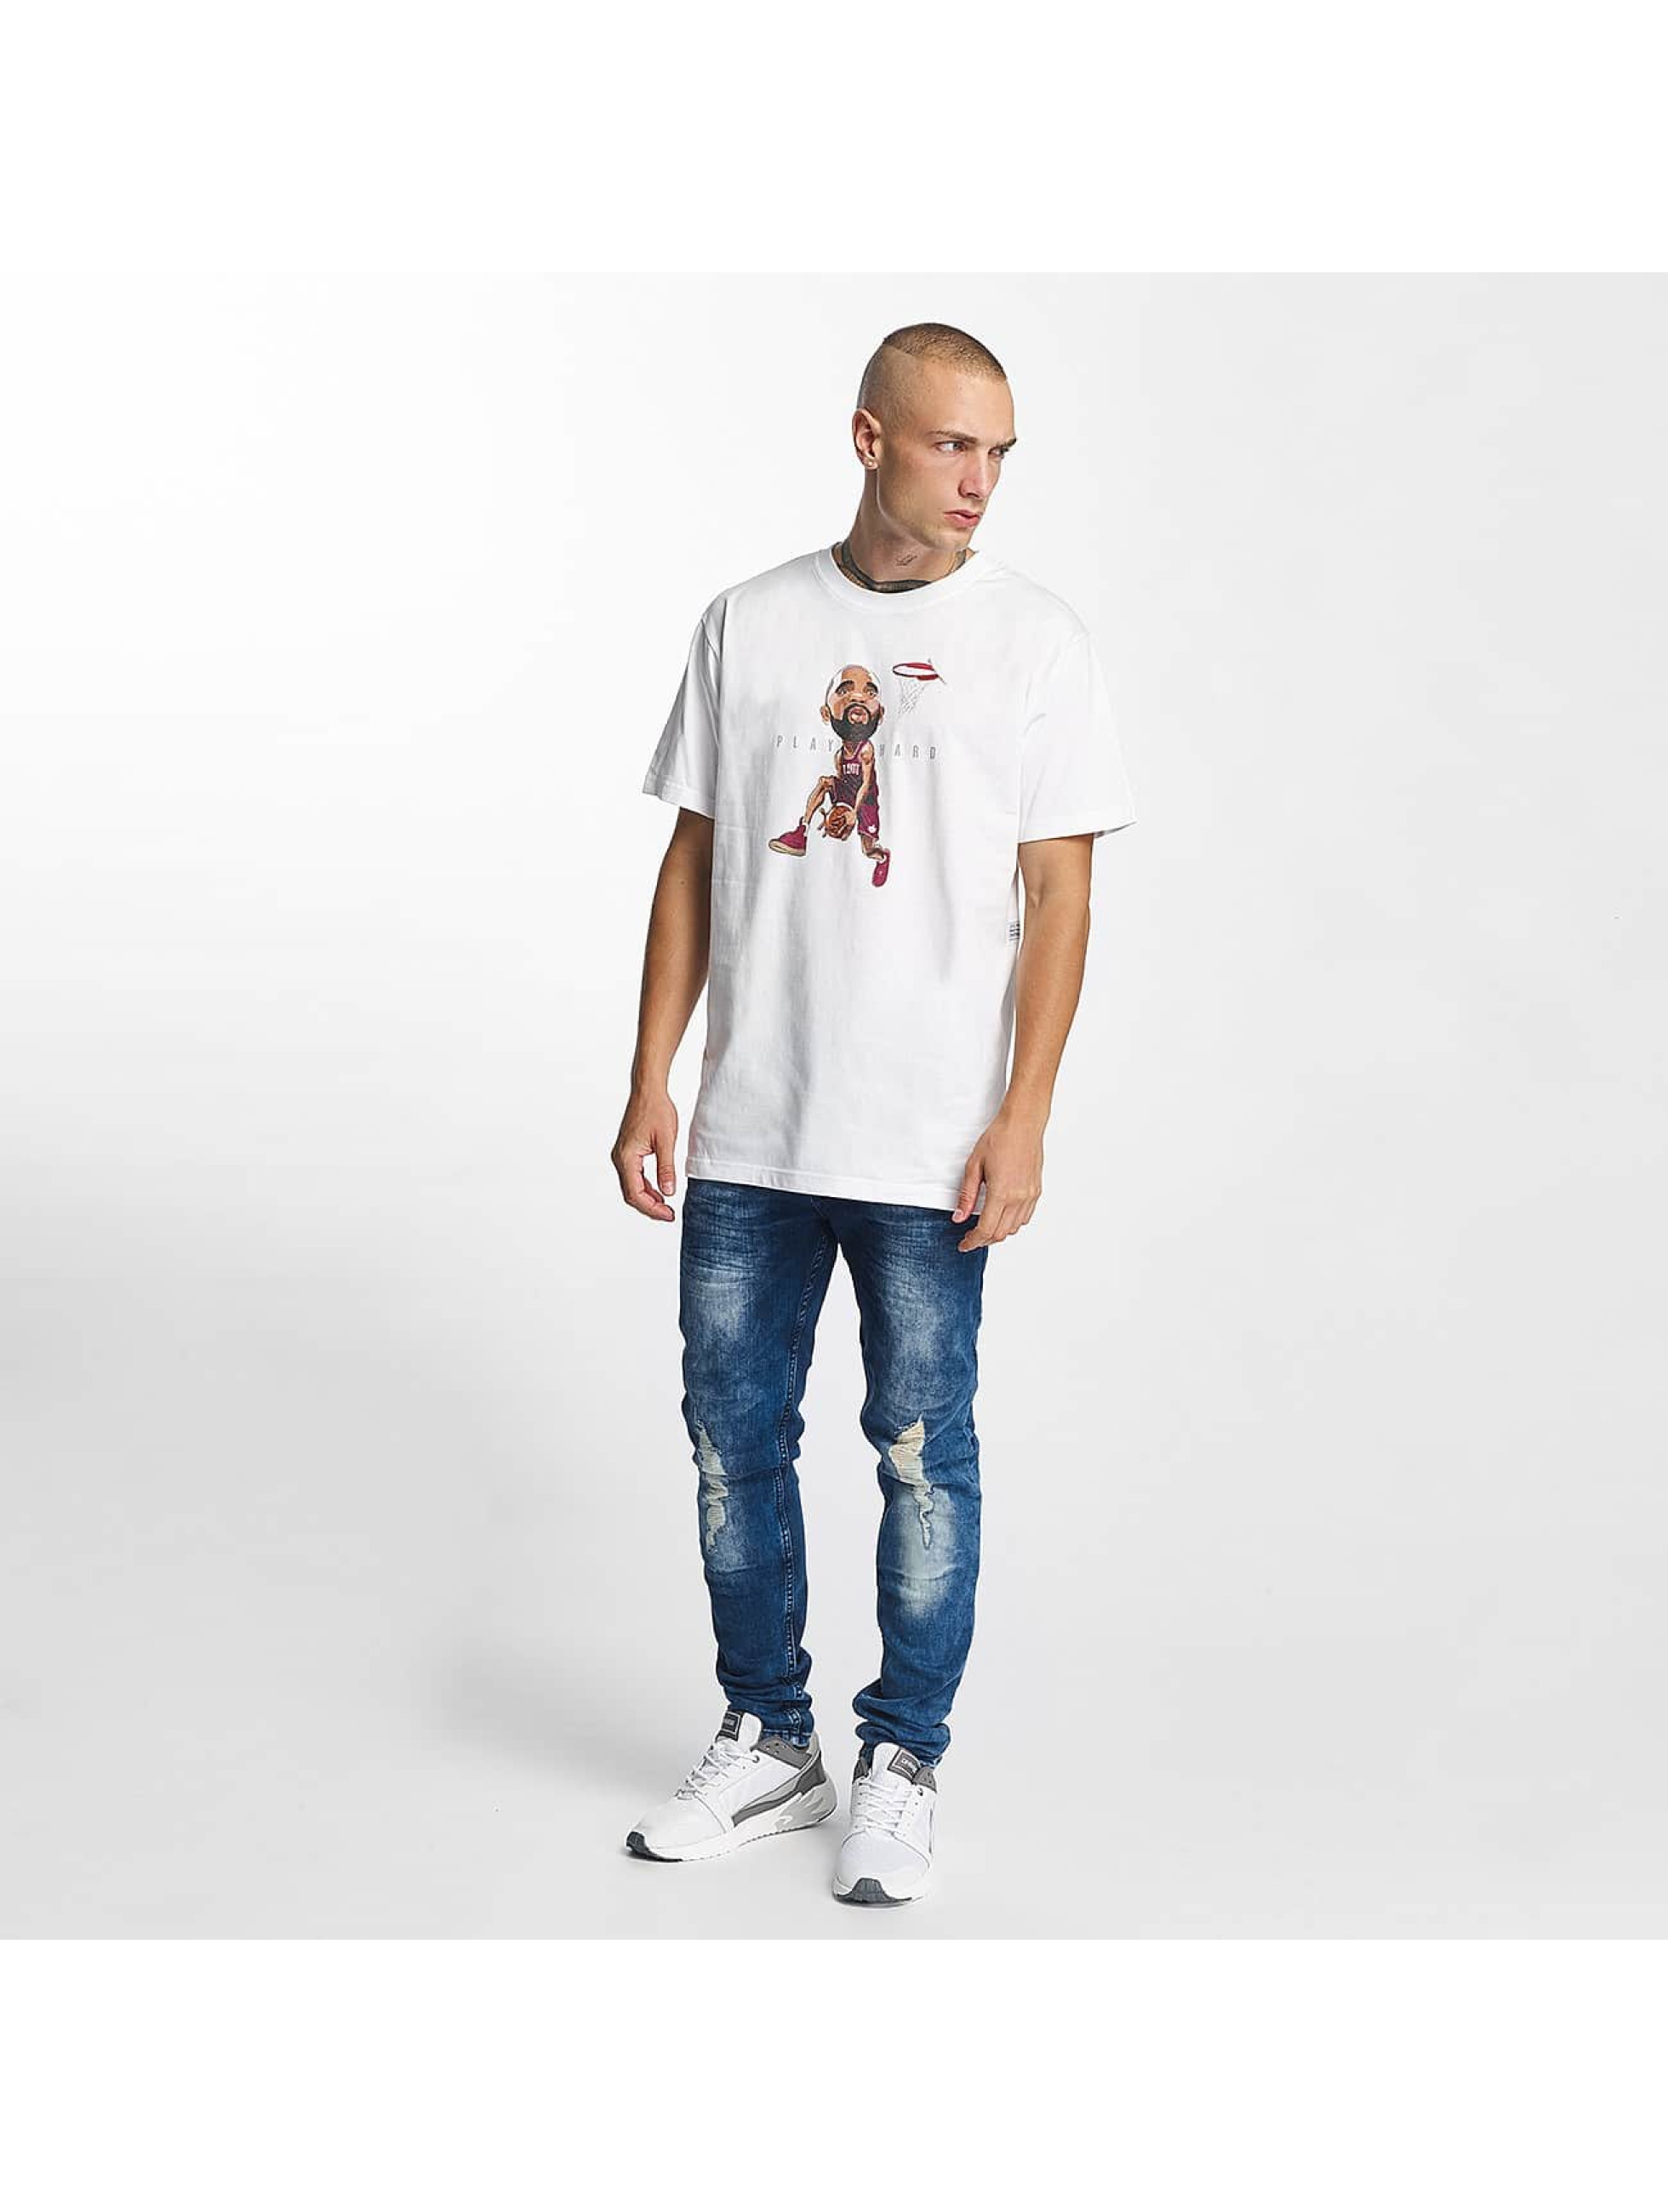 K1X Camiseta T.Dot Dunk blanco